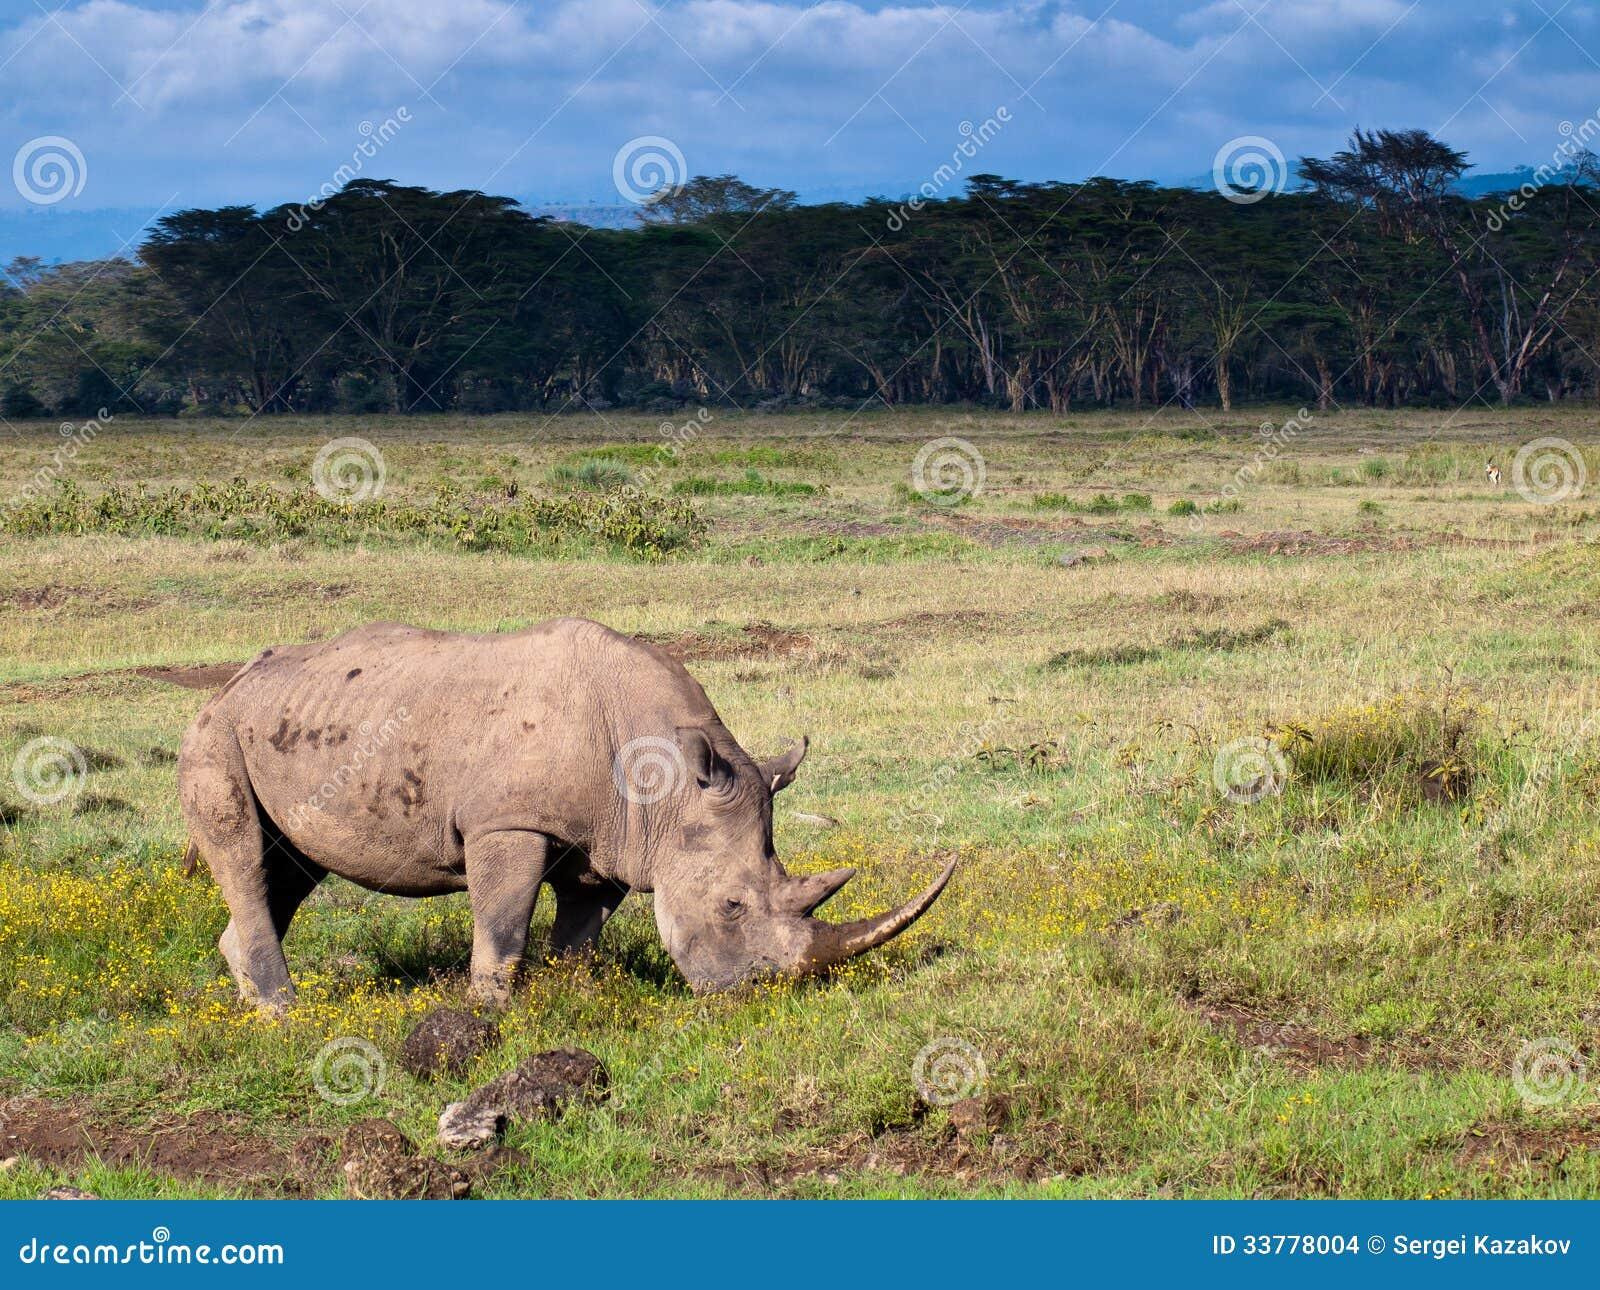 Adult rhino eating grass stock photo  Image of nature - 33778004